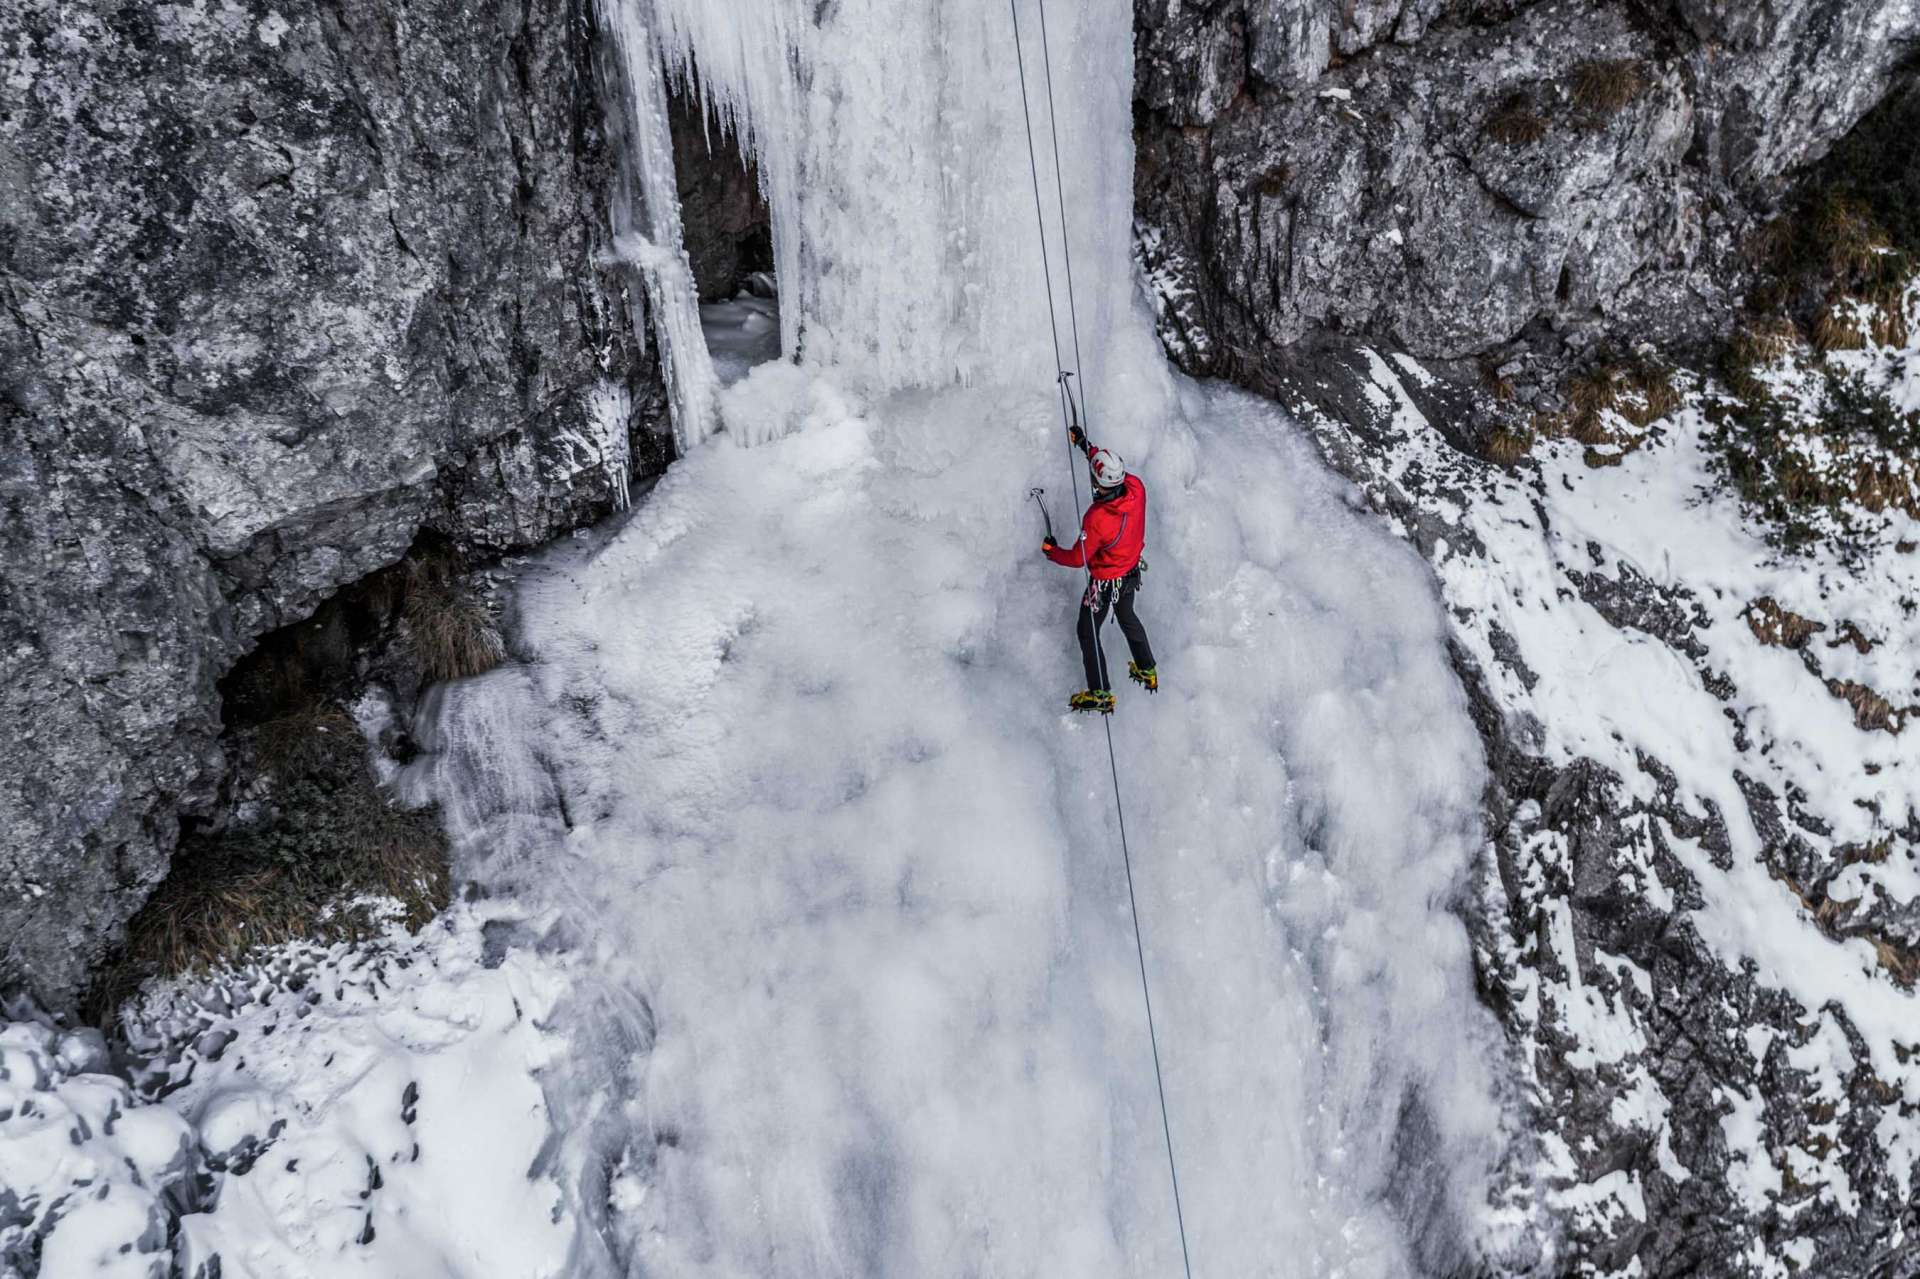 Ice Climbing Iced Waterfall Cascata Cambrembo Foppolo 2